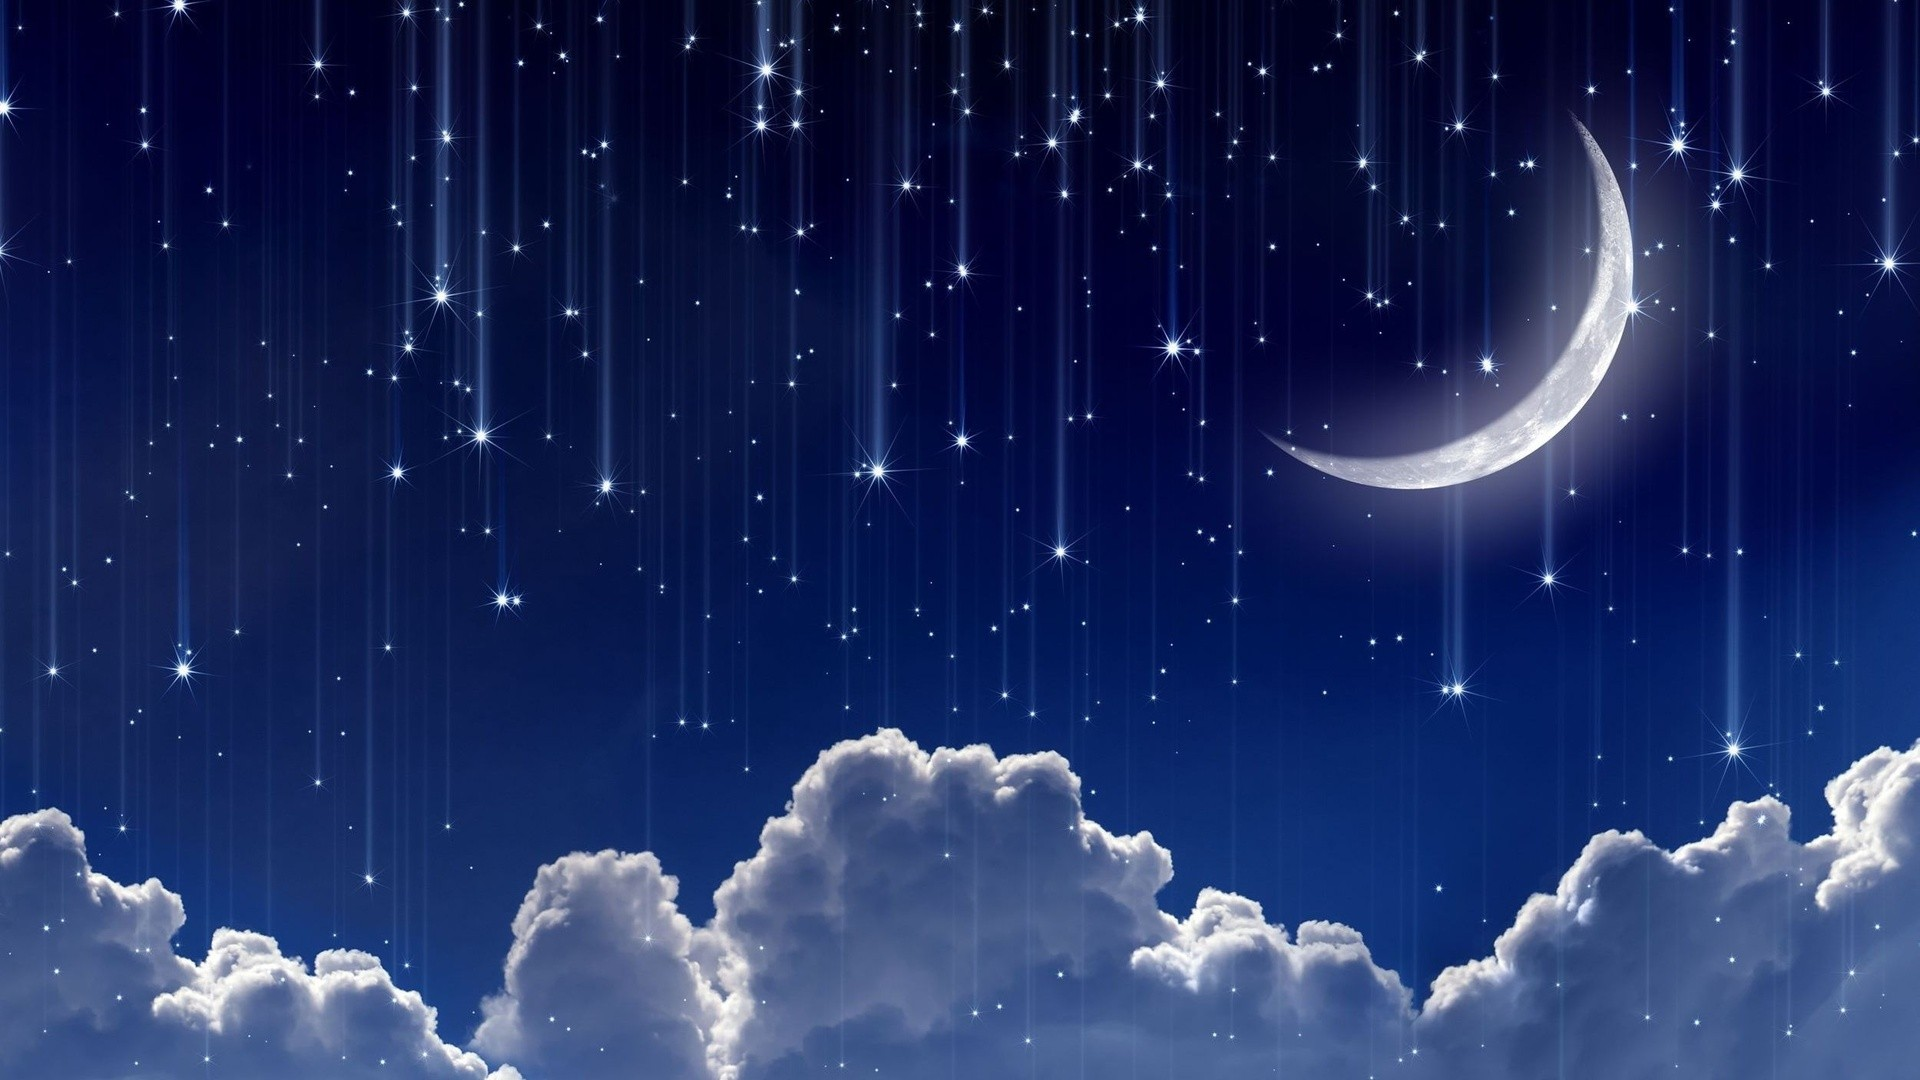 Falling Stars Wallpaper Fondos De Pantalla Arte Digital Noche Cielo Fondo